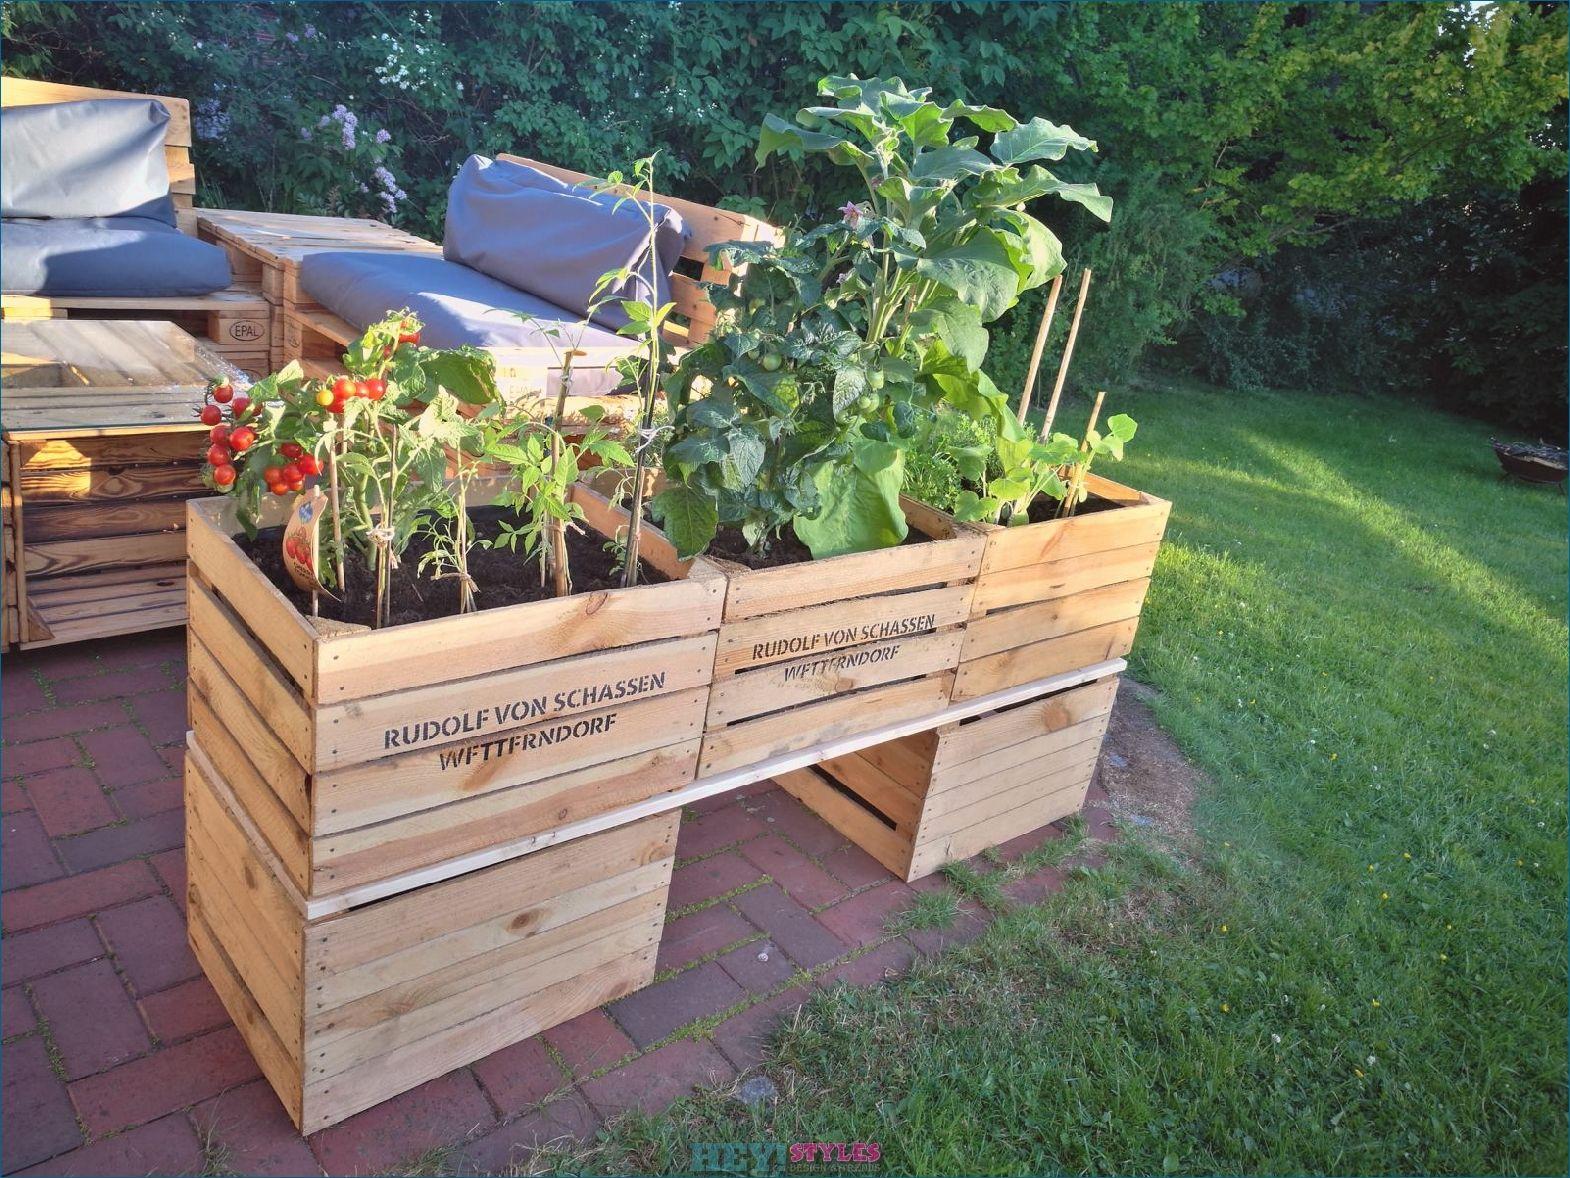 Build A Raised Bed Of Fruit Crates And Wine Crates Yourself Build Crates Fruit Raised Yourself Garden Boxes Diy Vertical Garden Diy Diy Trellis